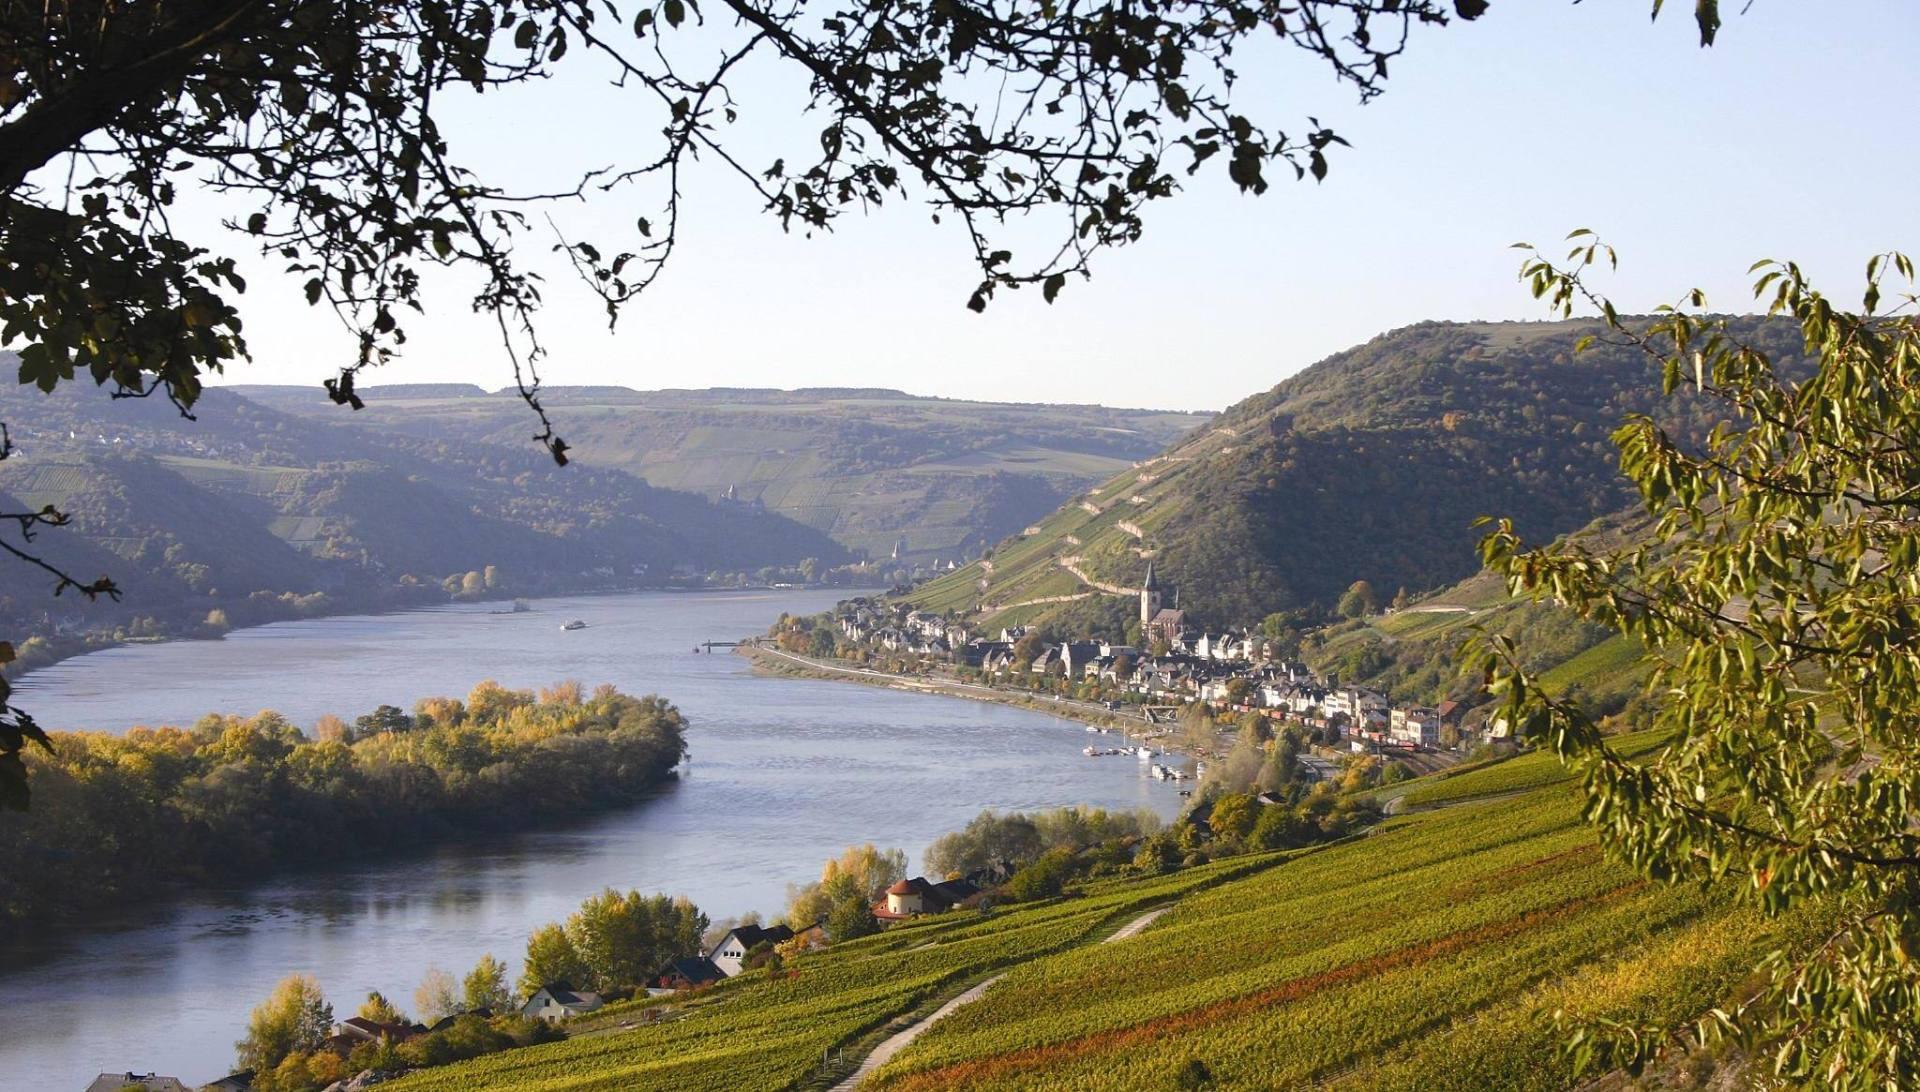 Germany's Rhineland